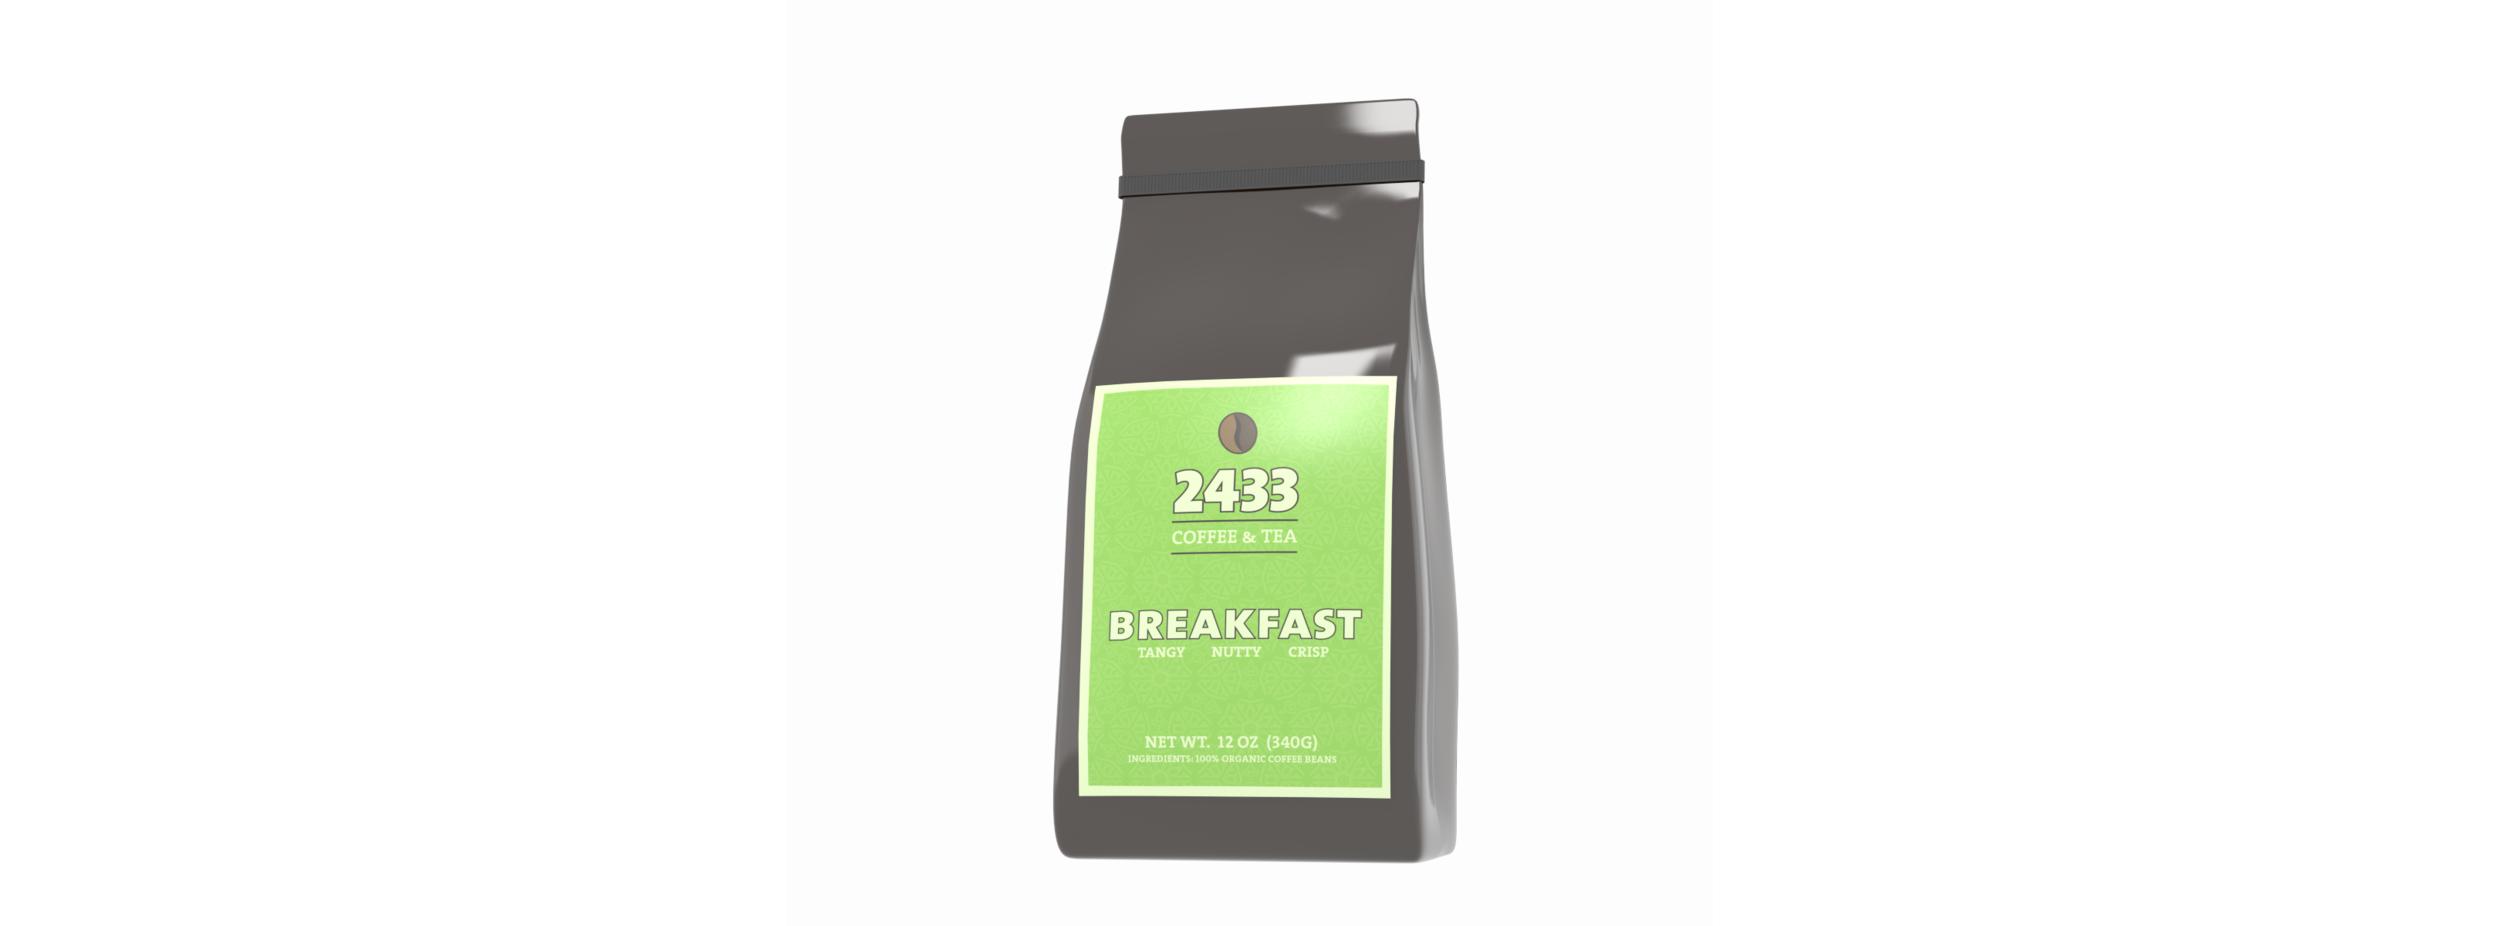 2433_coffeebag_single_wide.png